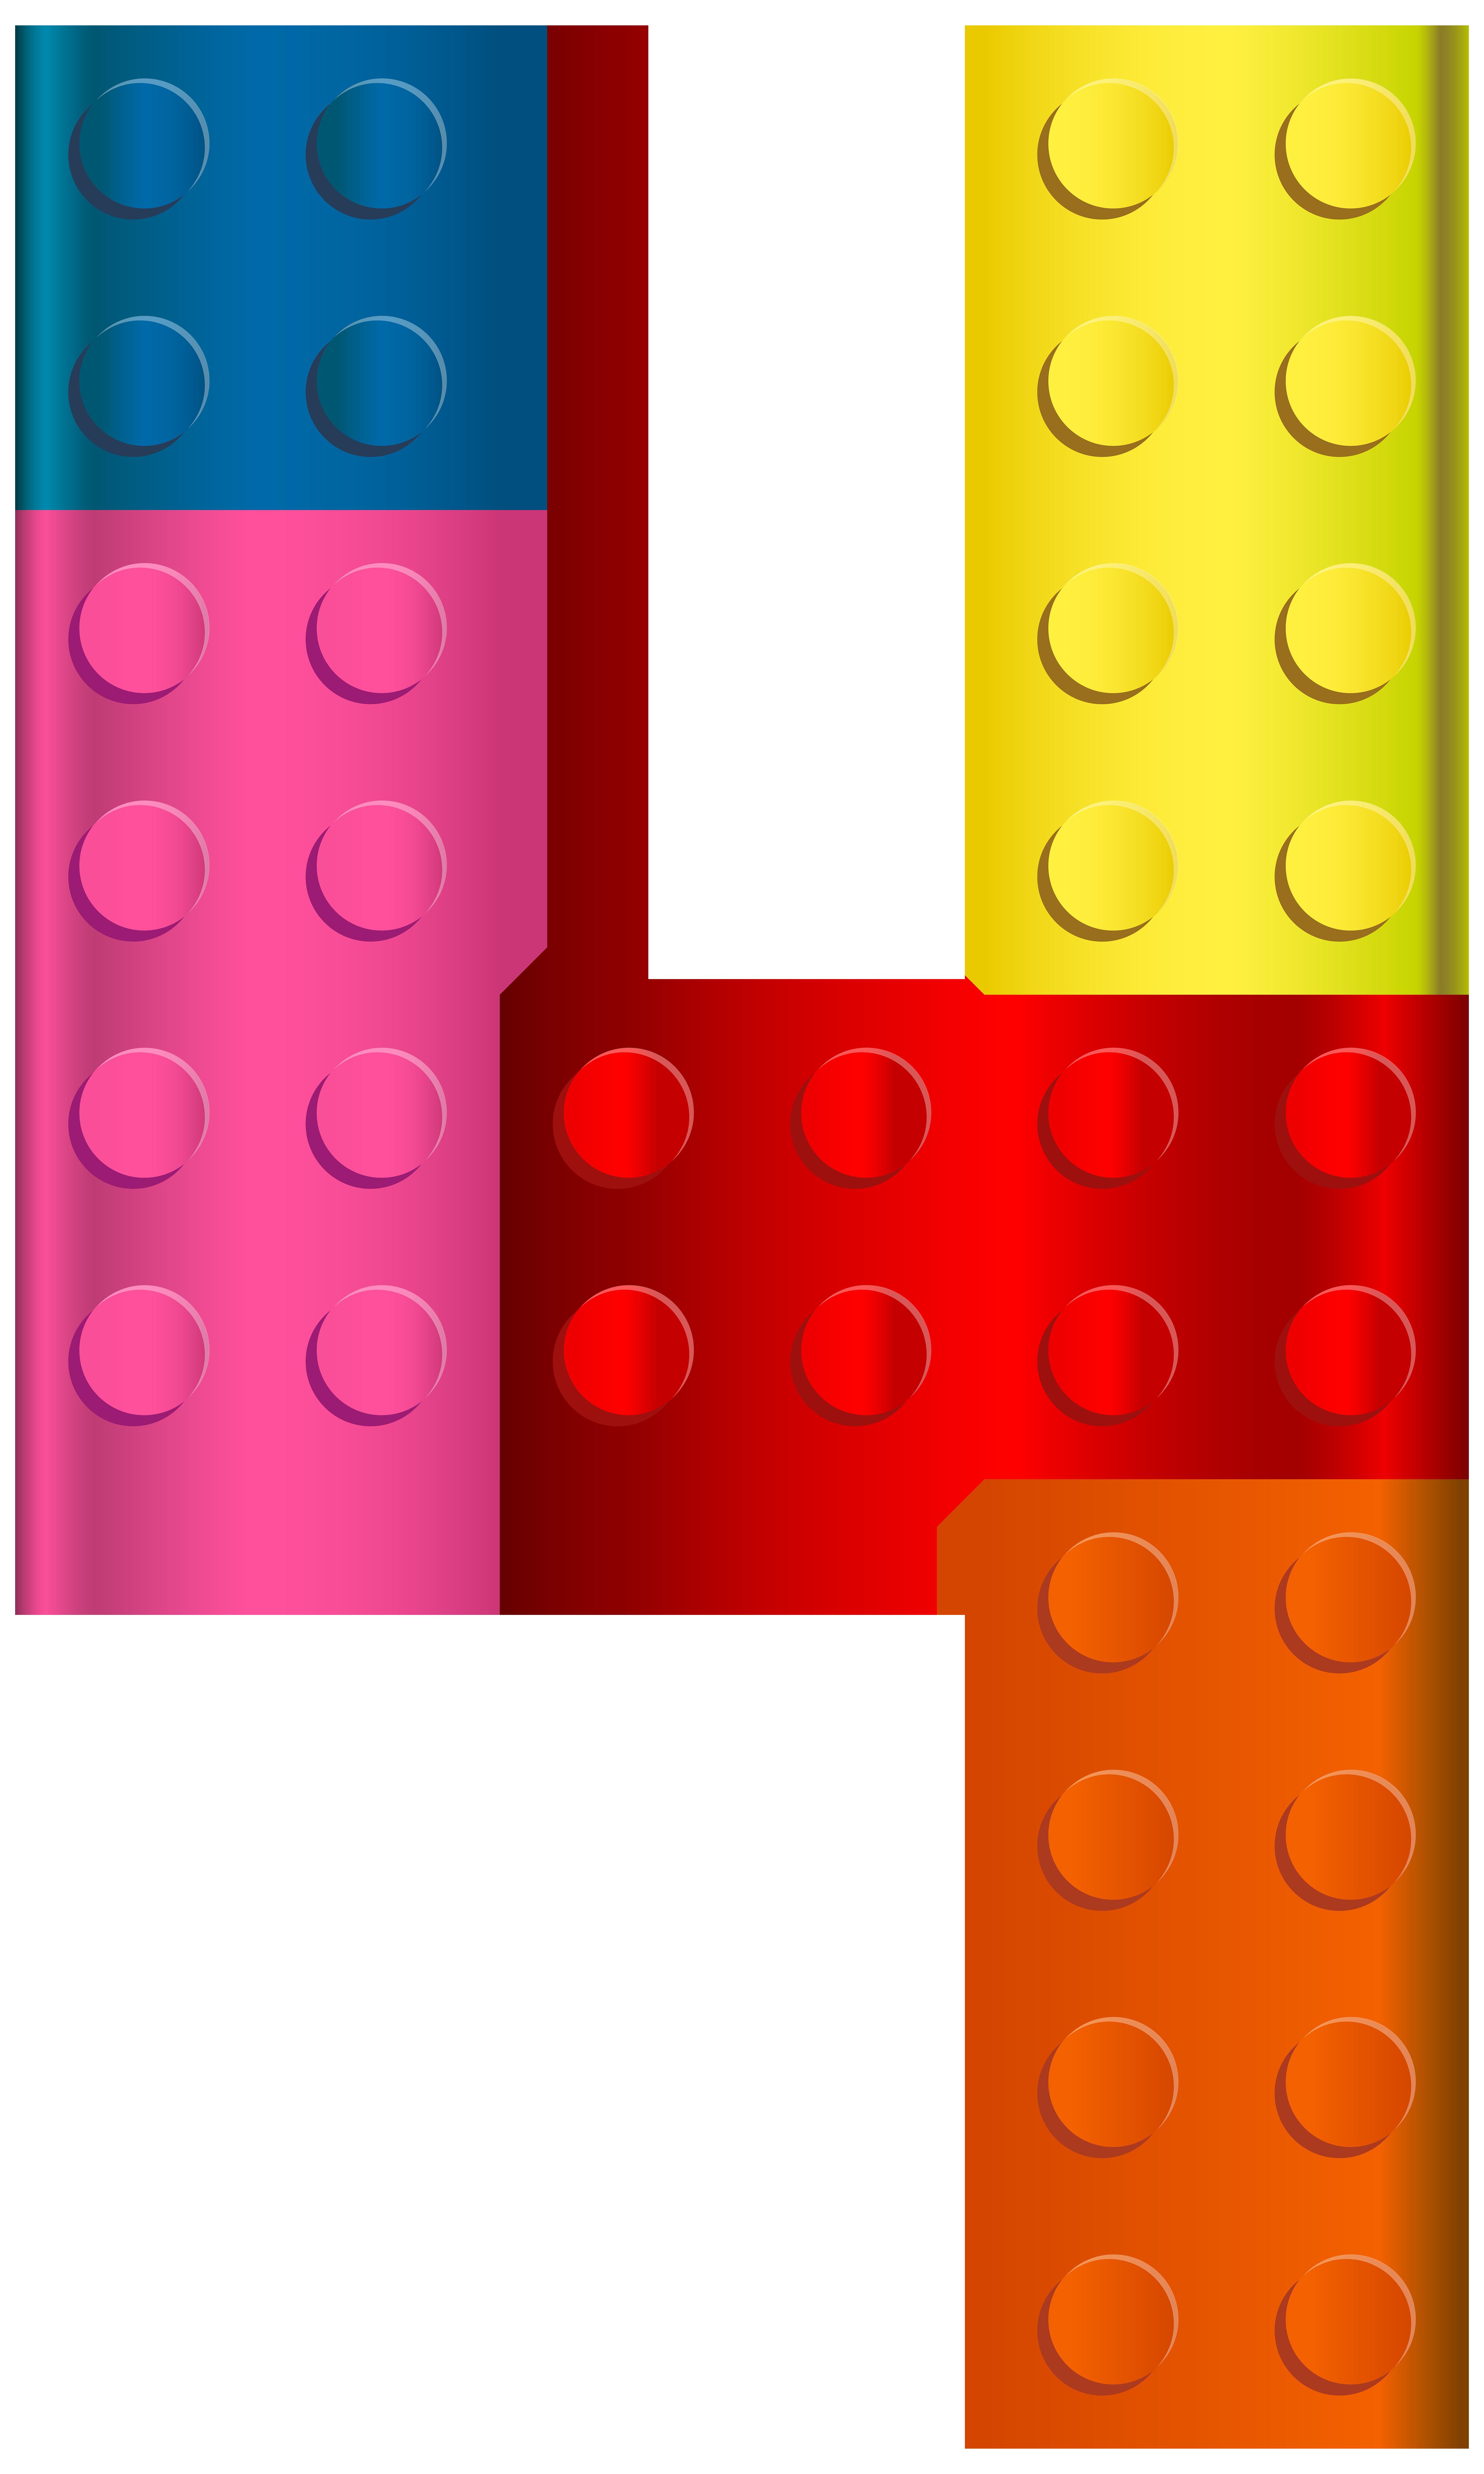 Lego number four transparent clip art image.